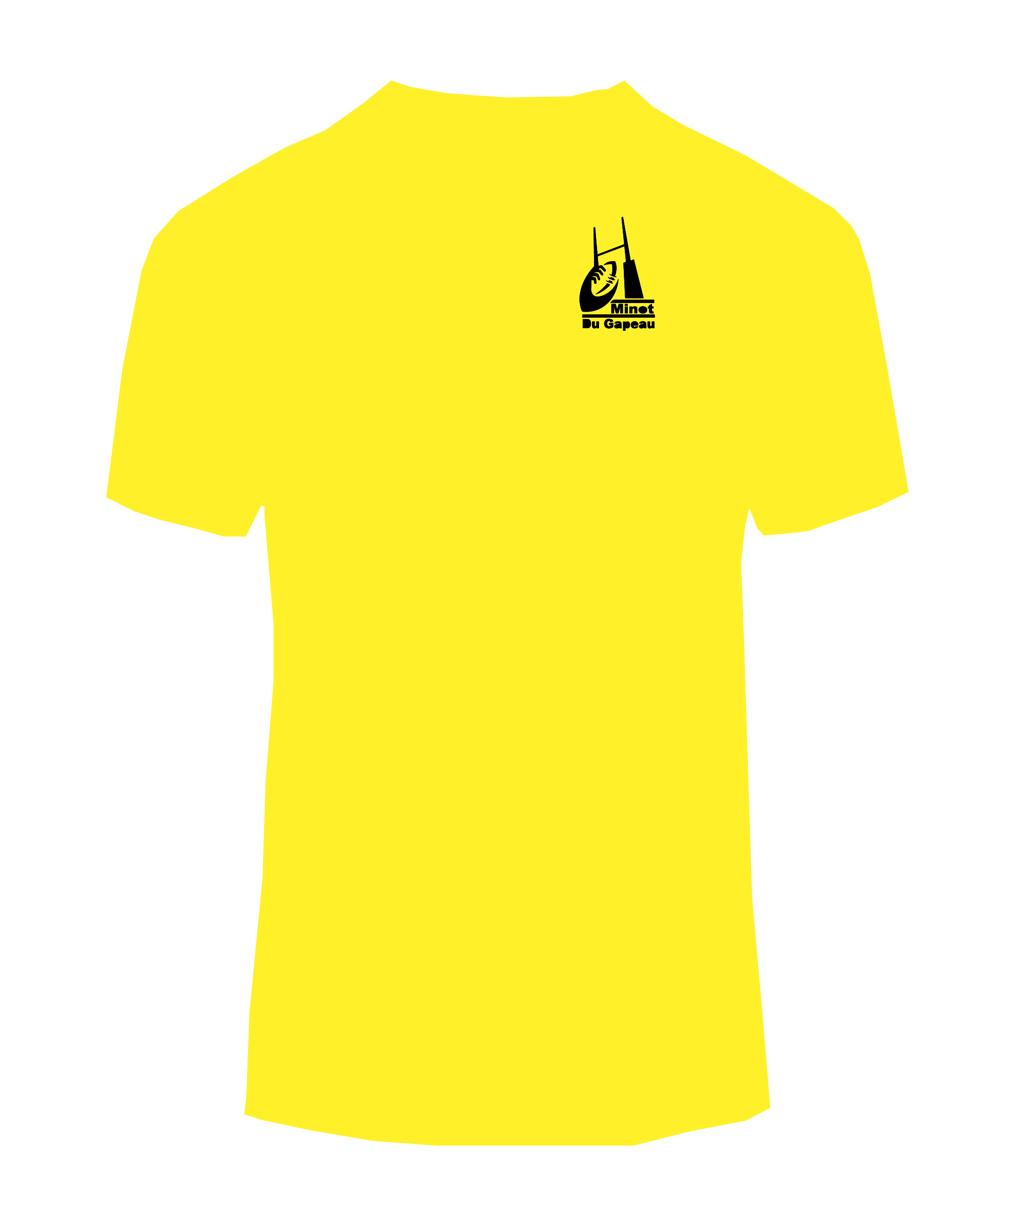 t-shirt homme jaune